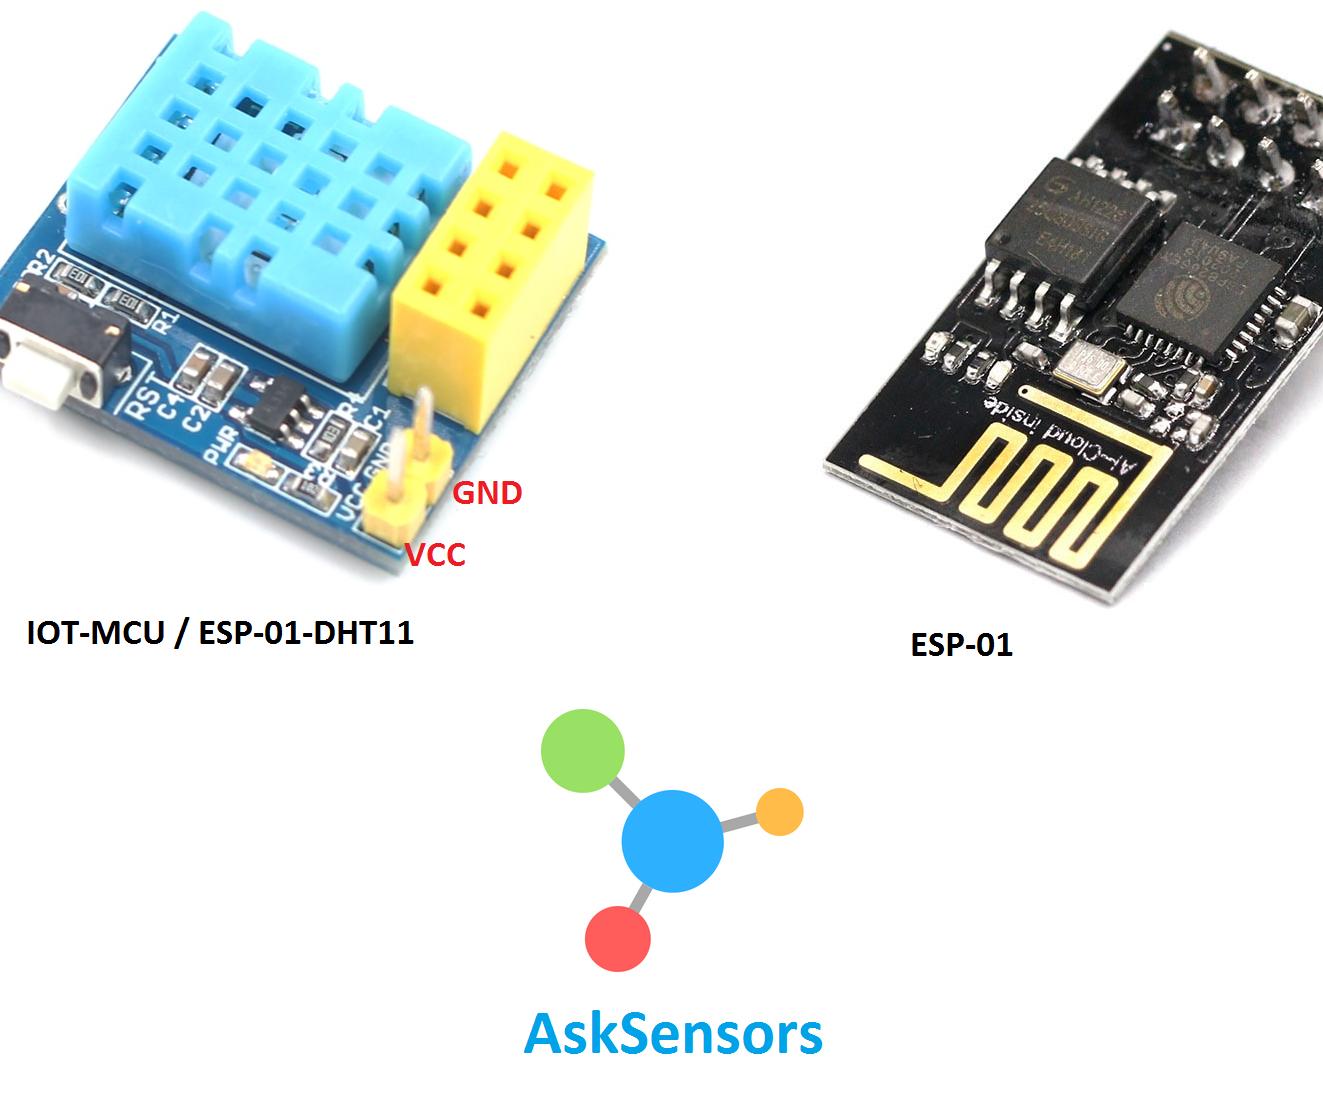 IoT-MCU Monitoring Using the AskSensors IoT Platform